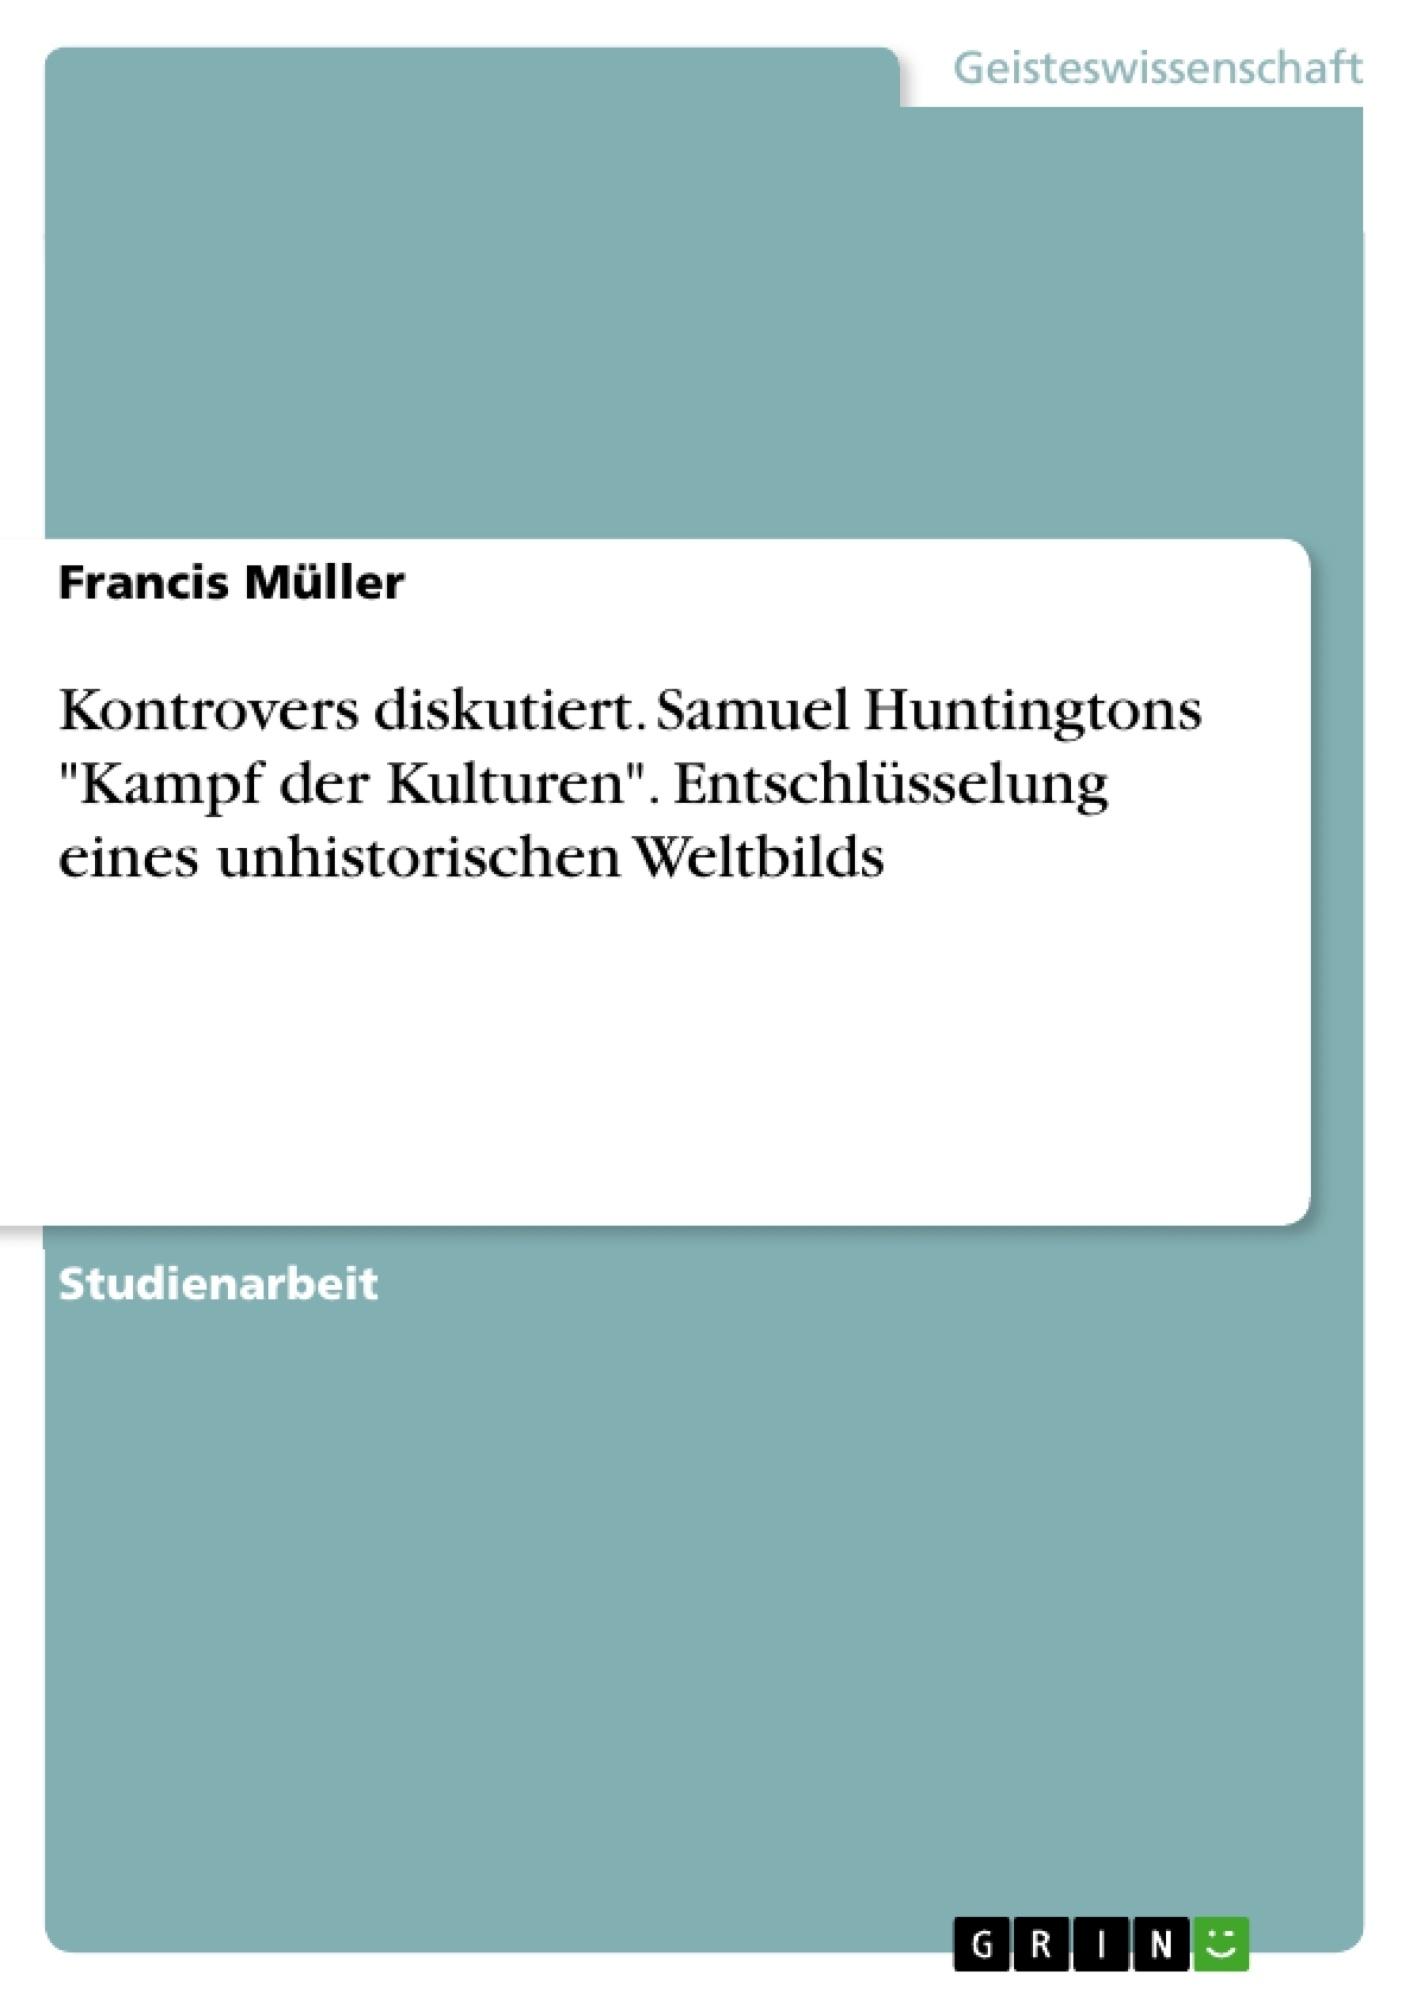 "Titel: Kontrovers diskutiert. Samuel Huntingtons ""Kampf der Kulturen"". Entschlüsselung eines unhistorischen Weltbilds"